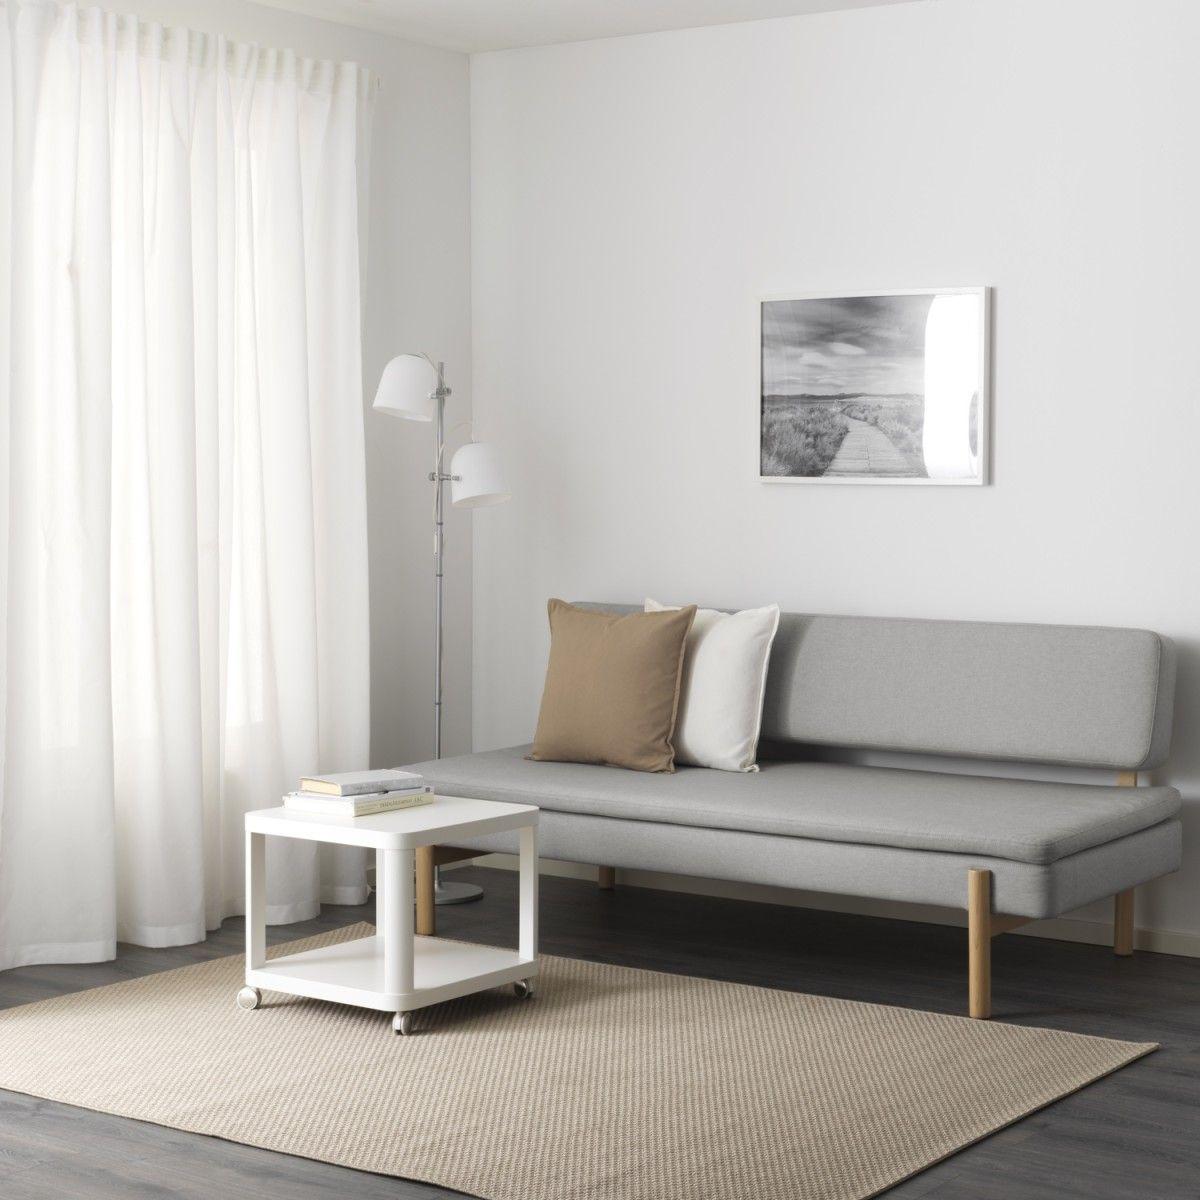 Ikea Hay Debut Their Sleek Minimalist Furniture Collection  # Ikea Casablanca